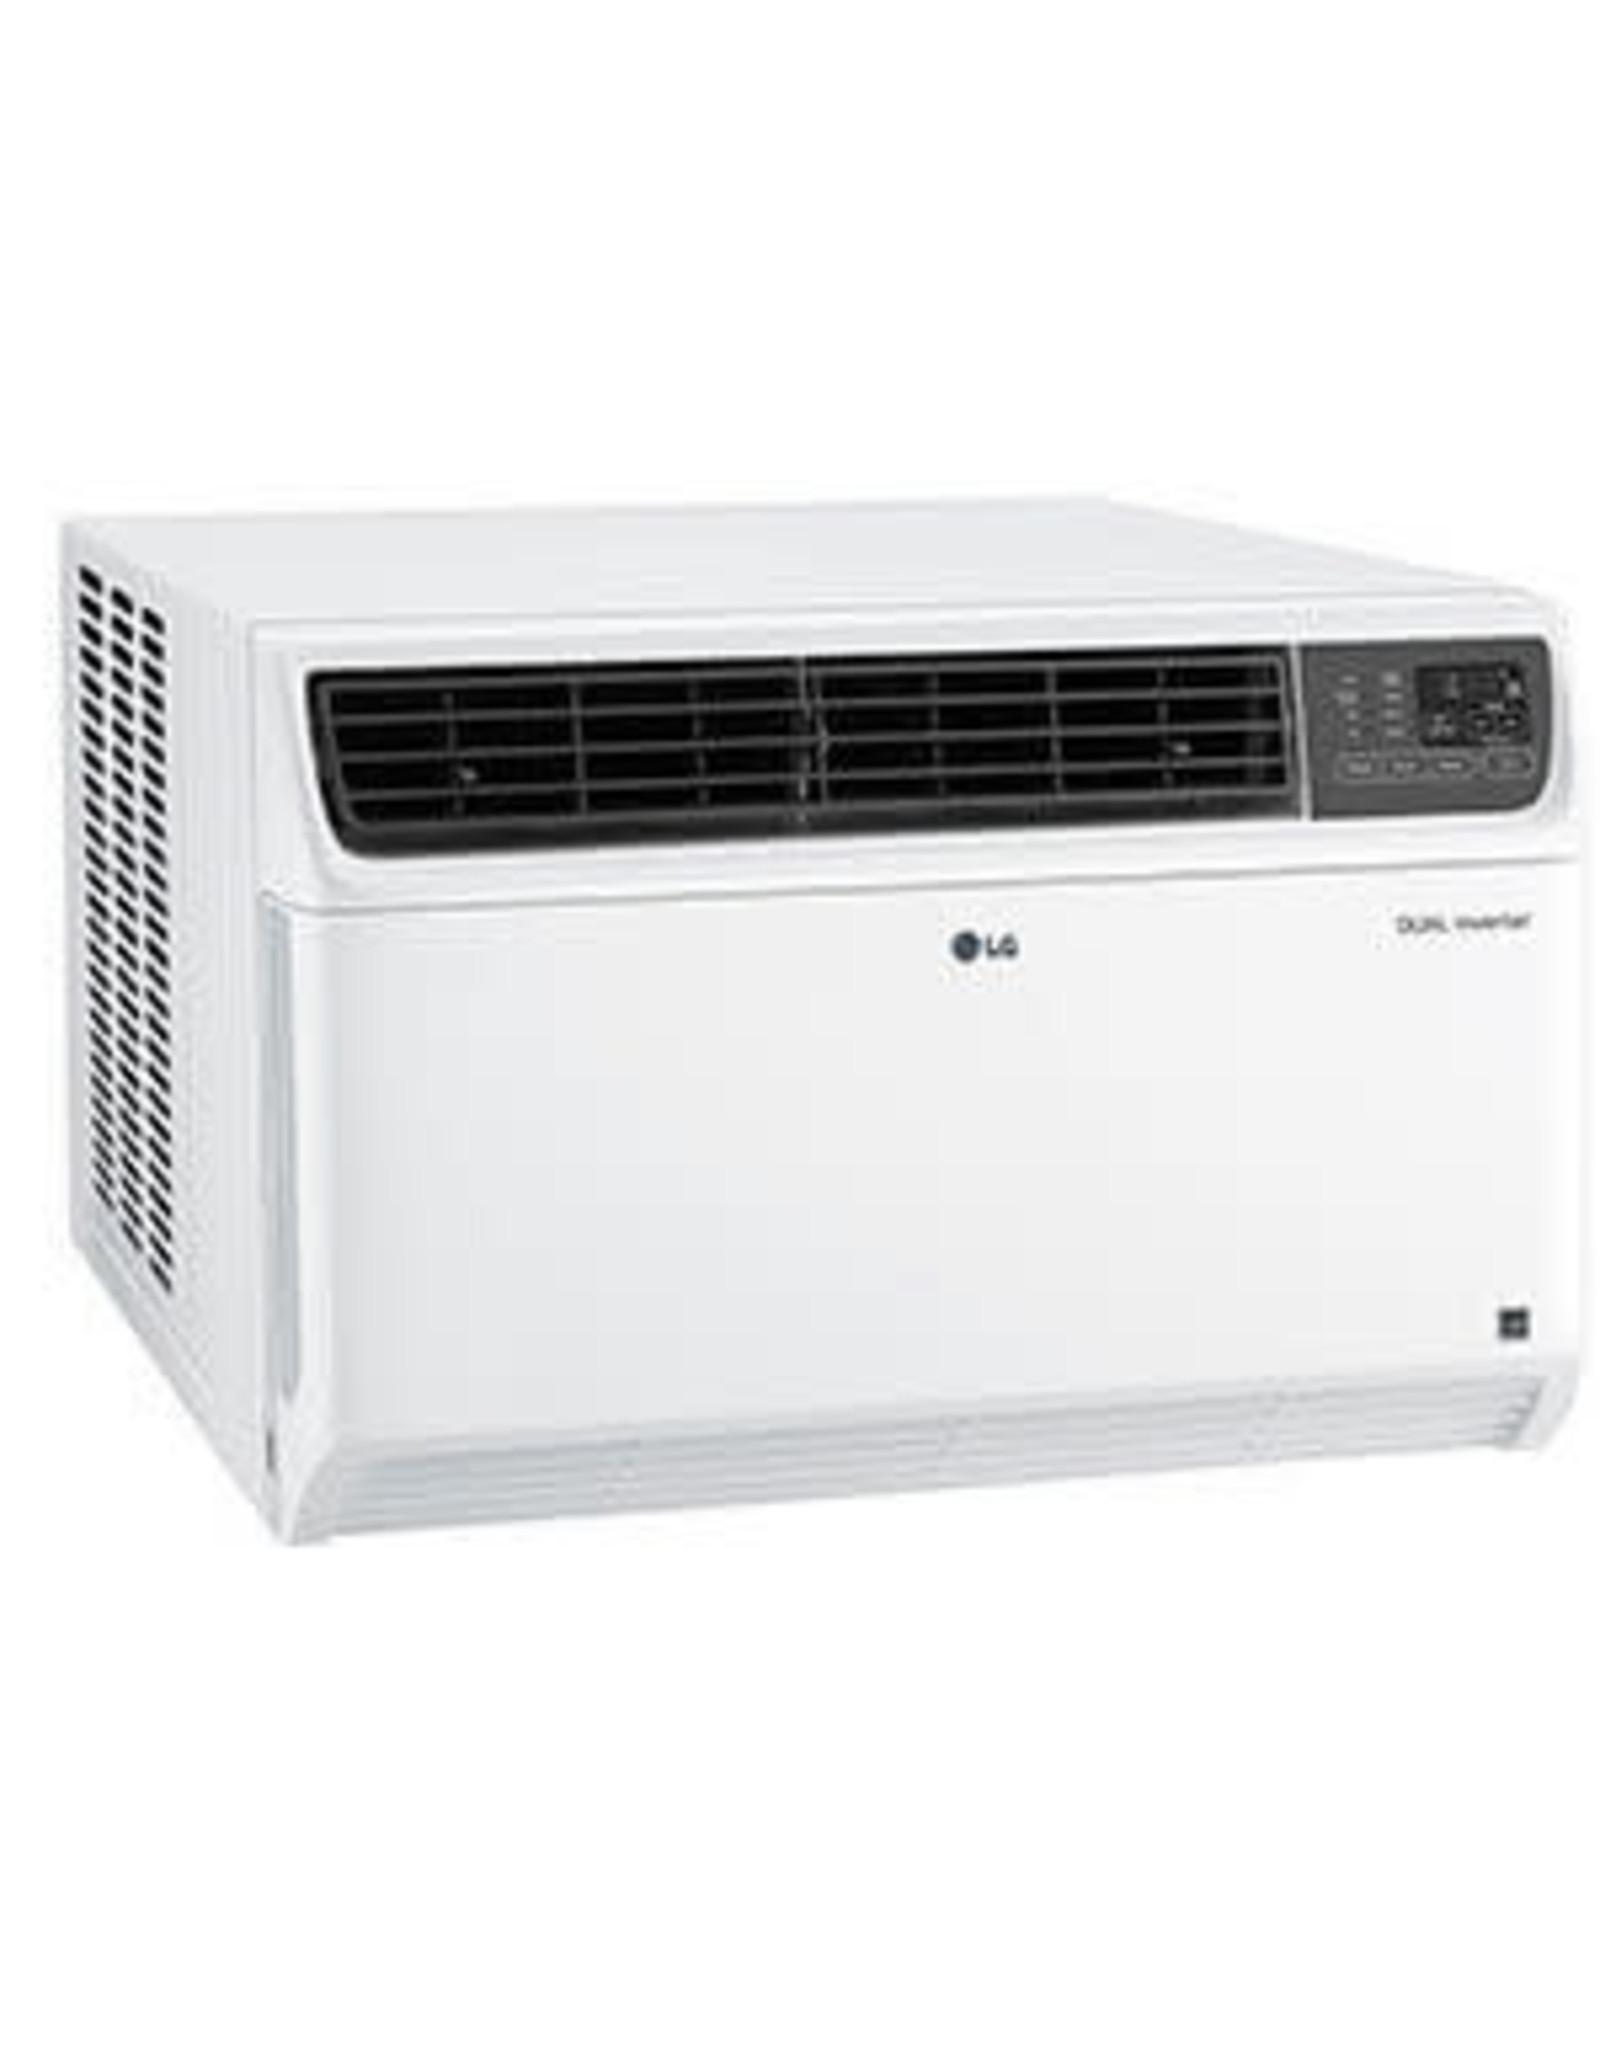 LG Electronics 14,000 BTU DUAL Inverter Smart wi-fi Enabled Window Air Conditioner